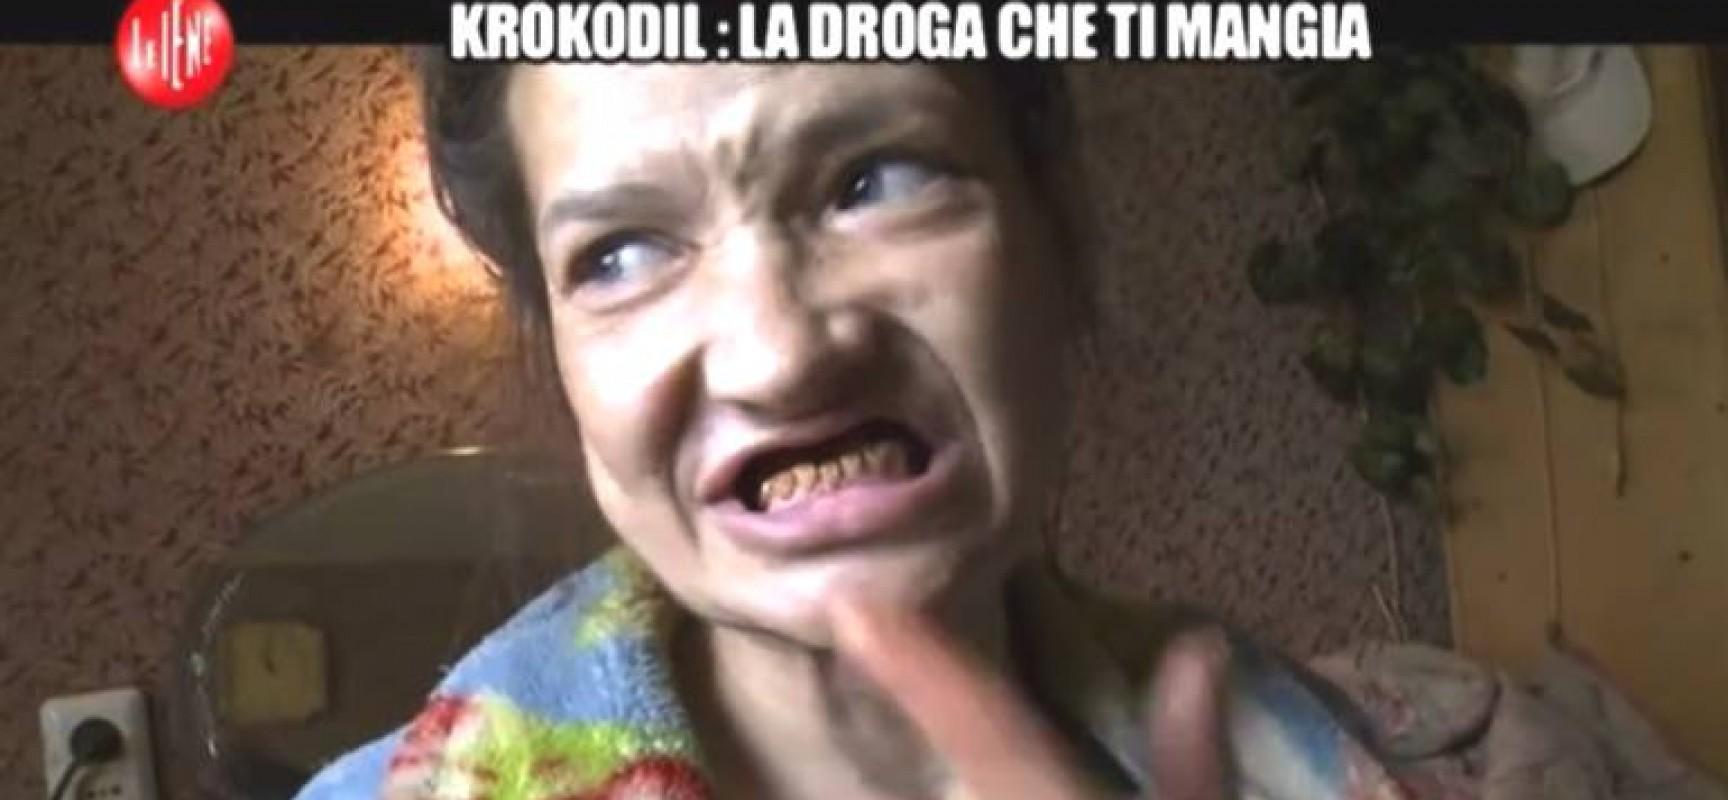 Krokodil: la nuova droga che ti mangia vivo